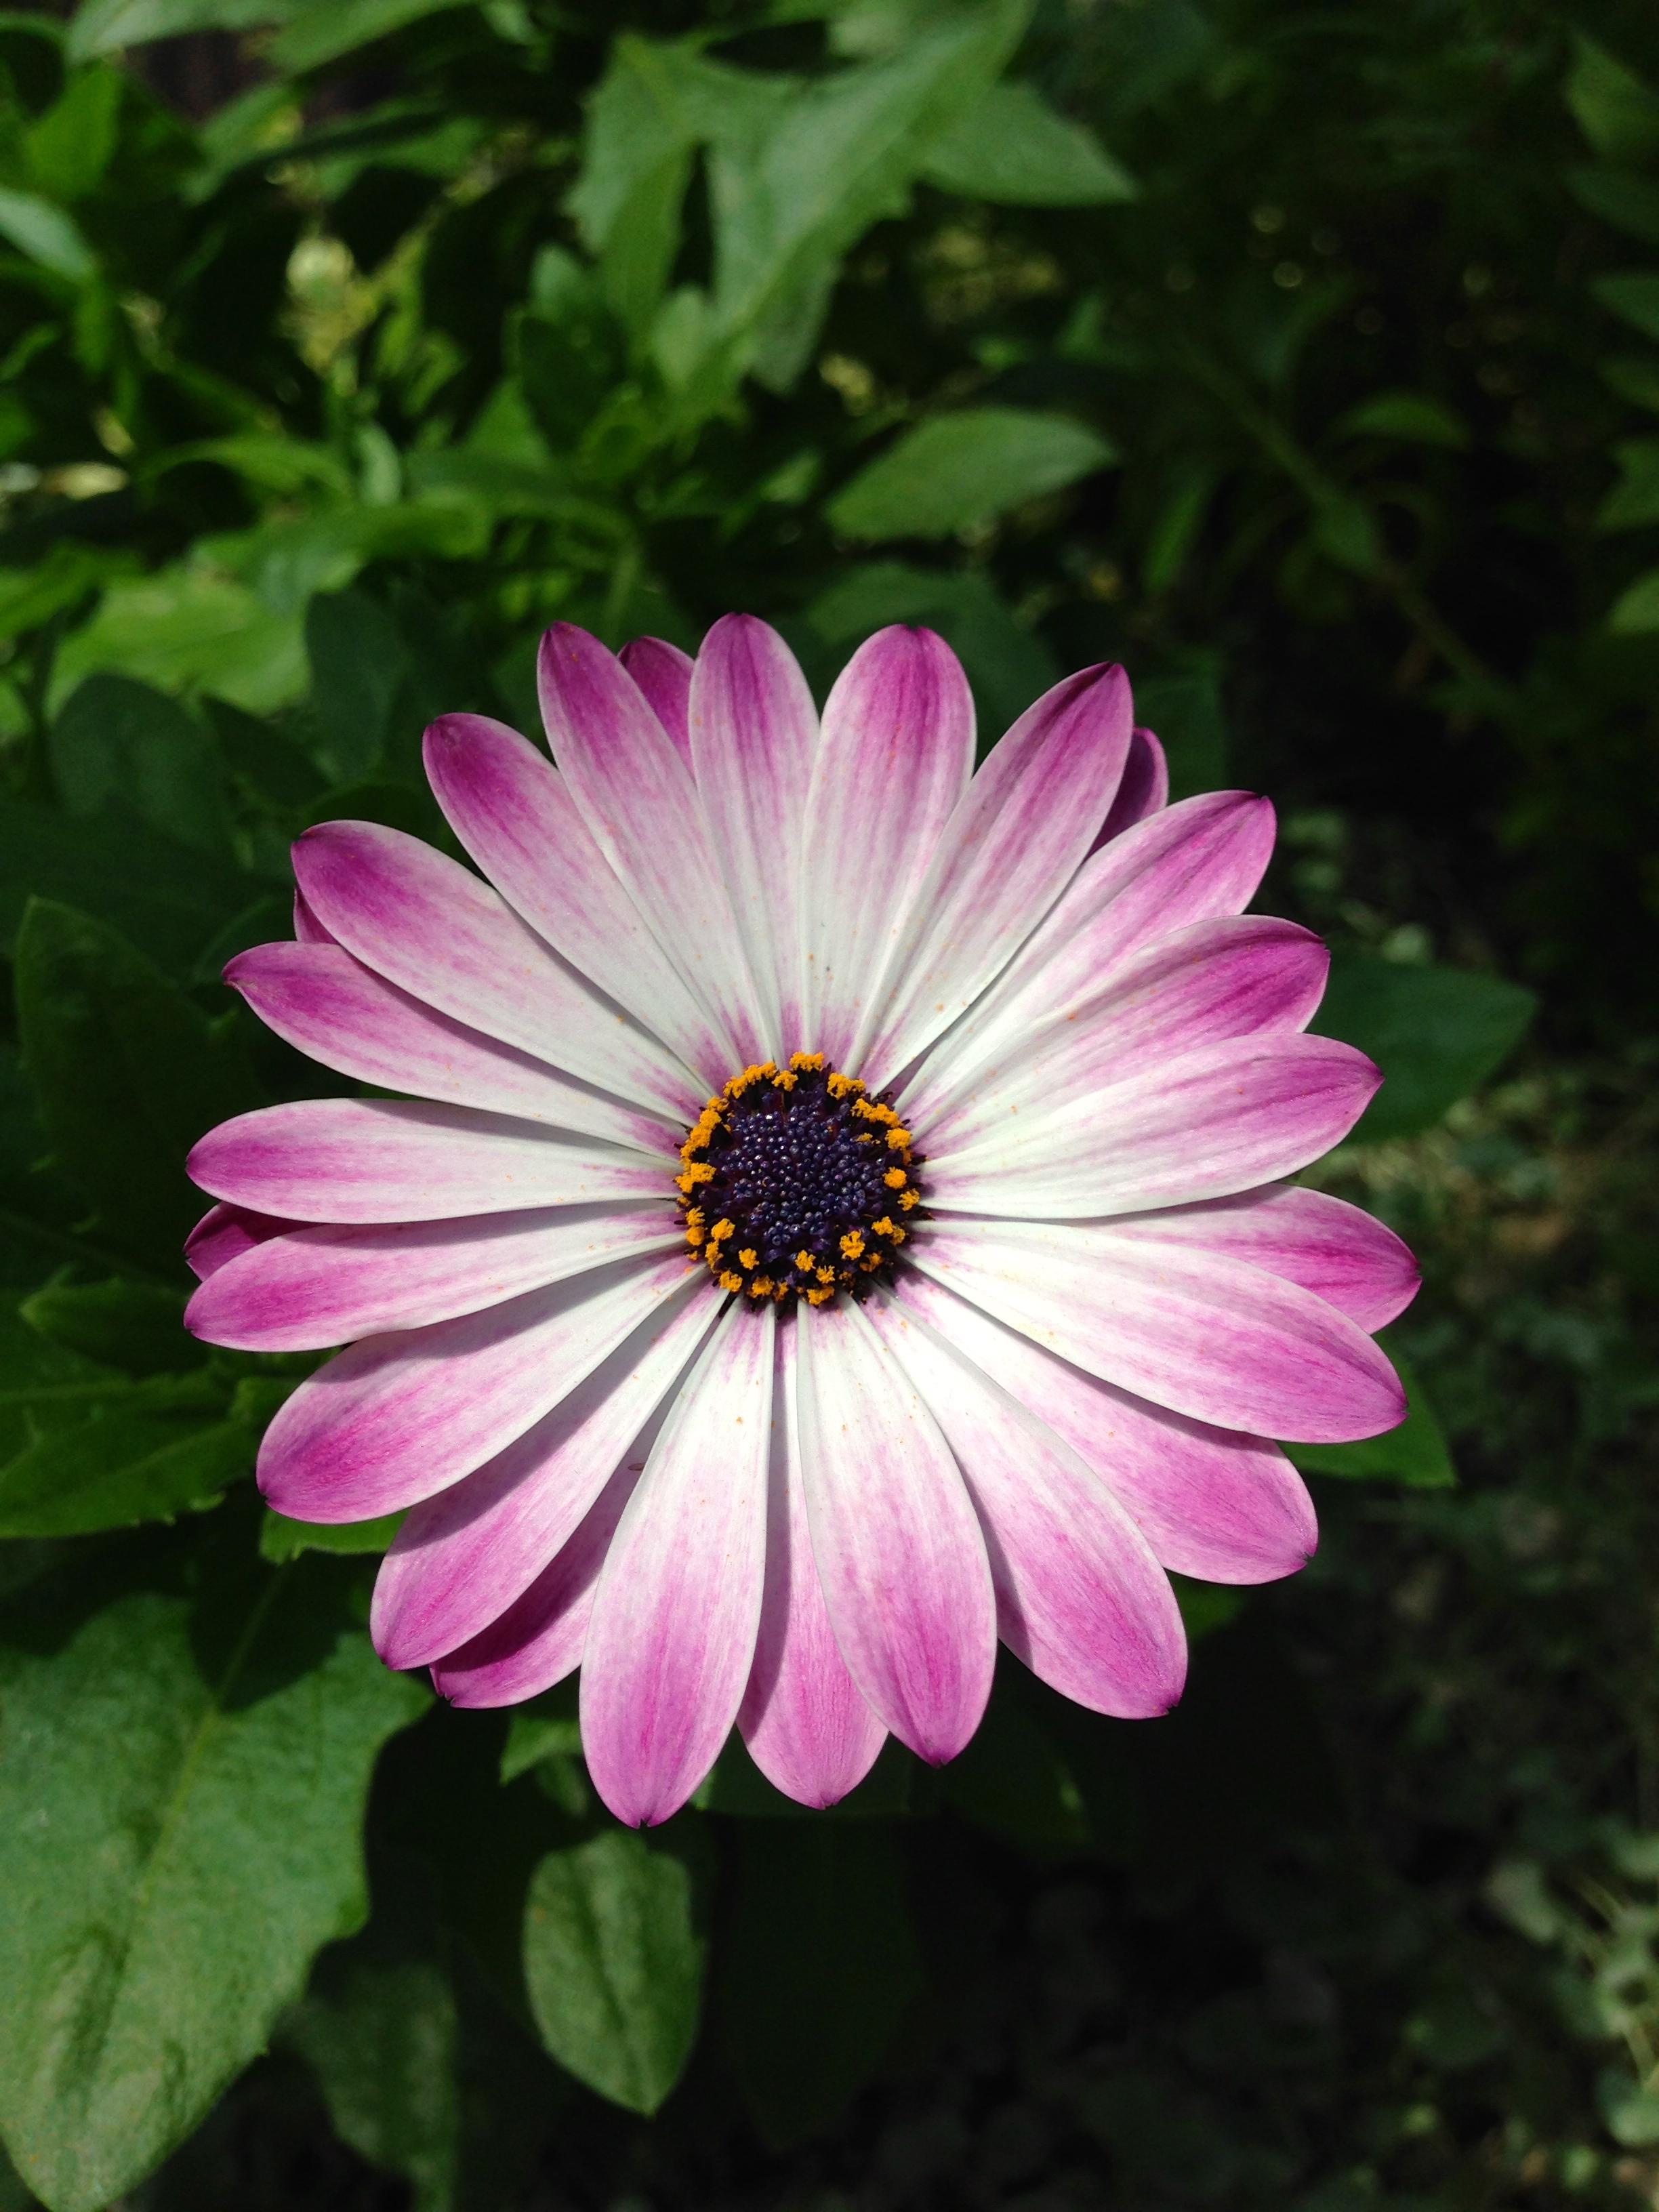 Flower of the day july 16 2015 blue eyed daisy cocoaevenings img1037 izmirmasajfo